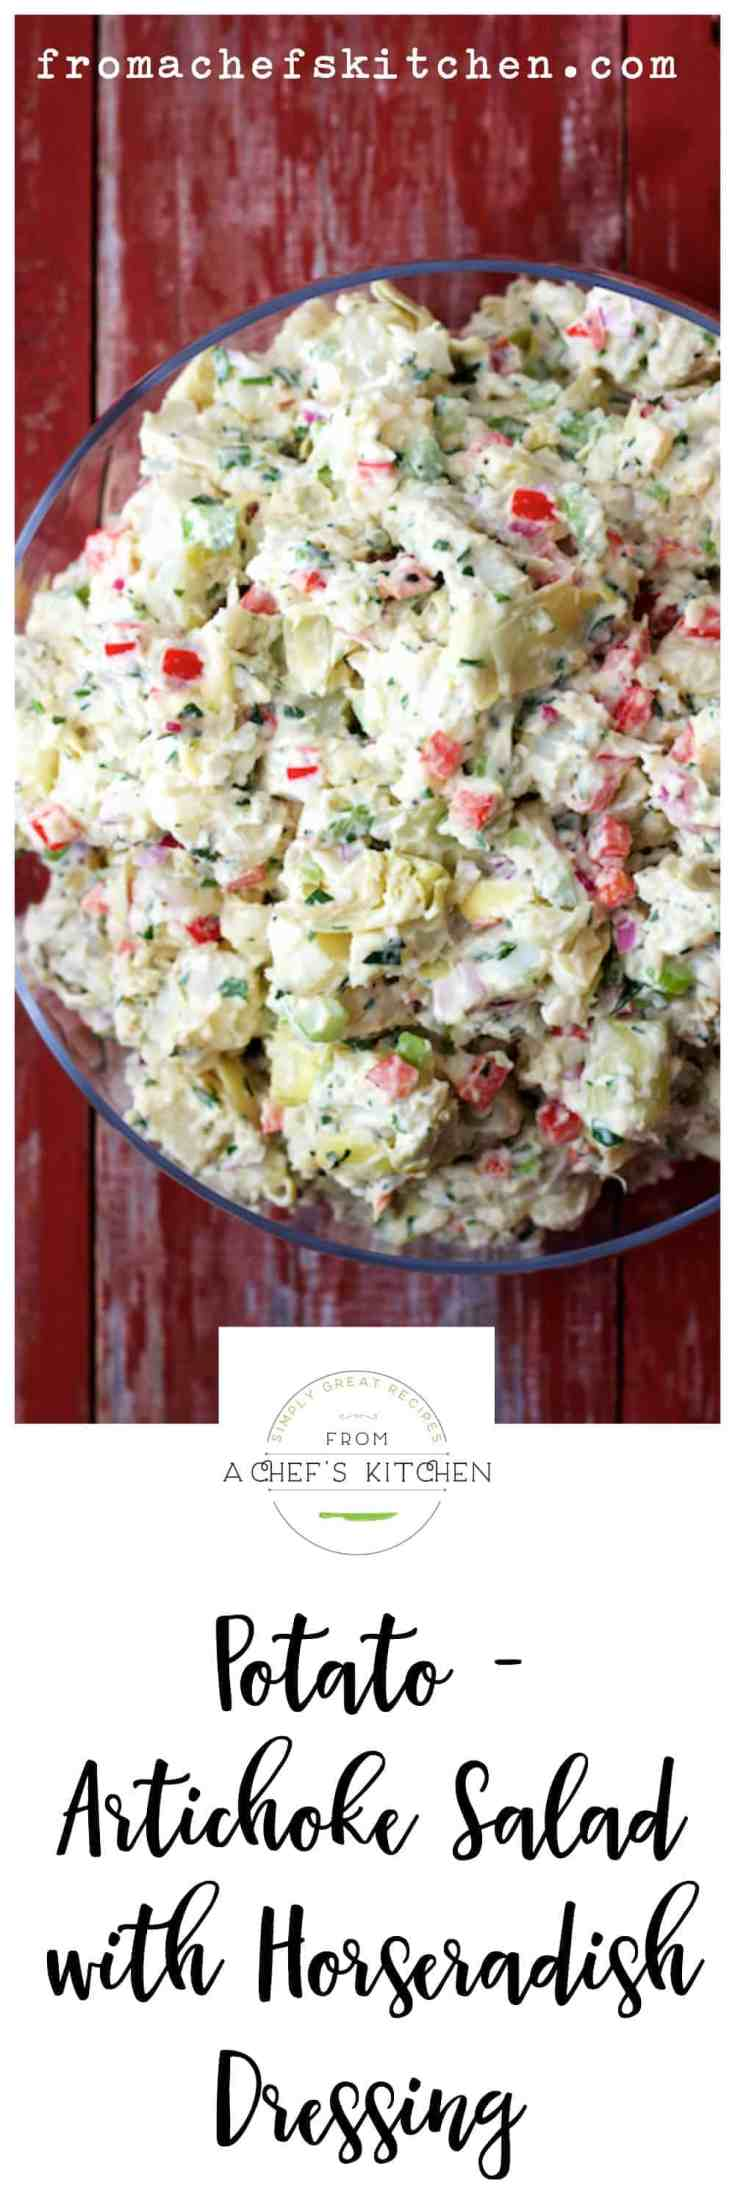 Potato Artichoke Salad with Horseradish Dressing is a zippy twist on potato salad! Potatoes and horseradish are a match made in heaven! #potatosalad #picnic #summerfood #picnicfoods